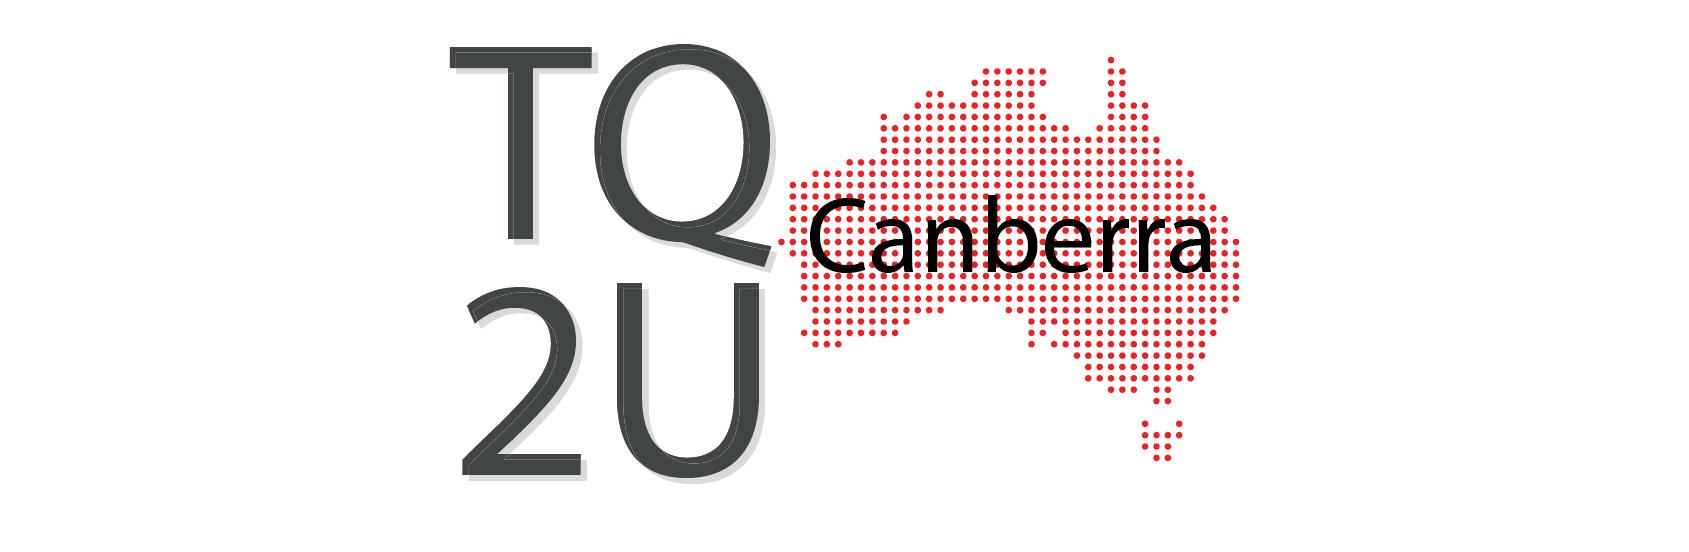 TQ2U: Canberra